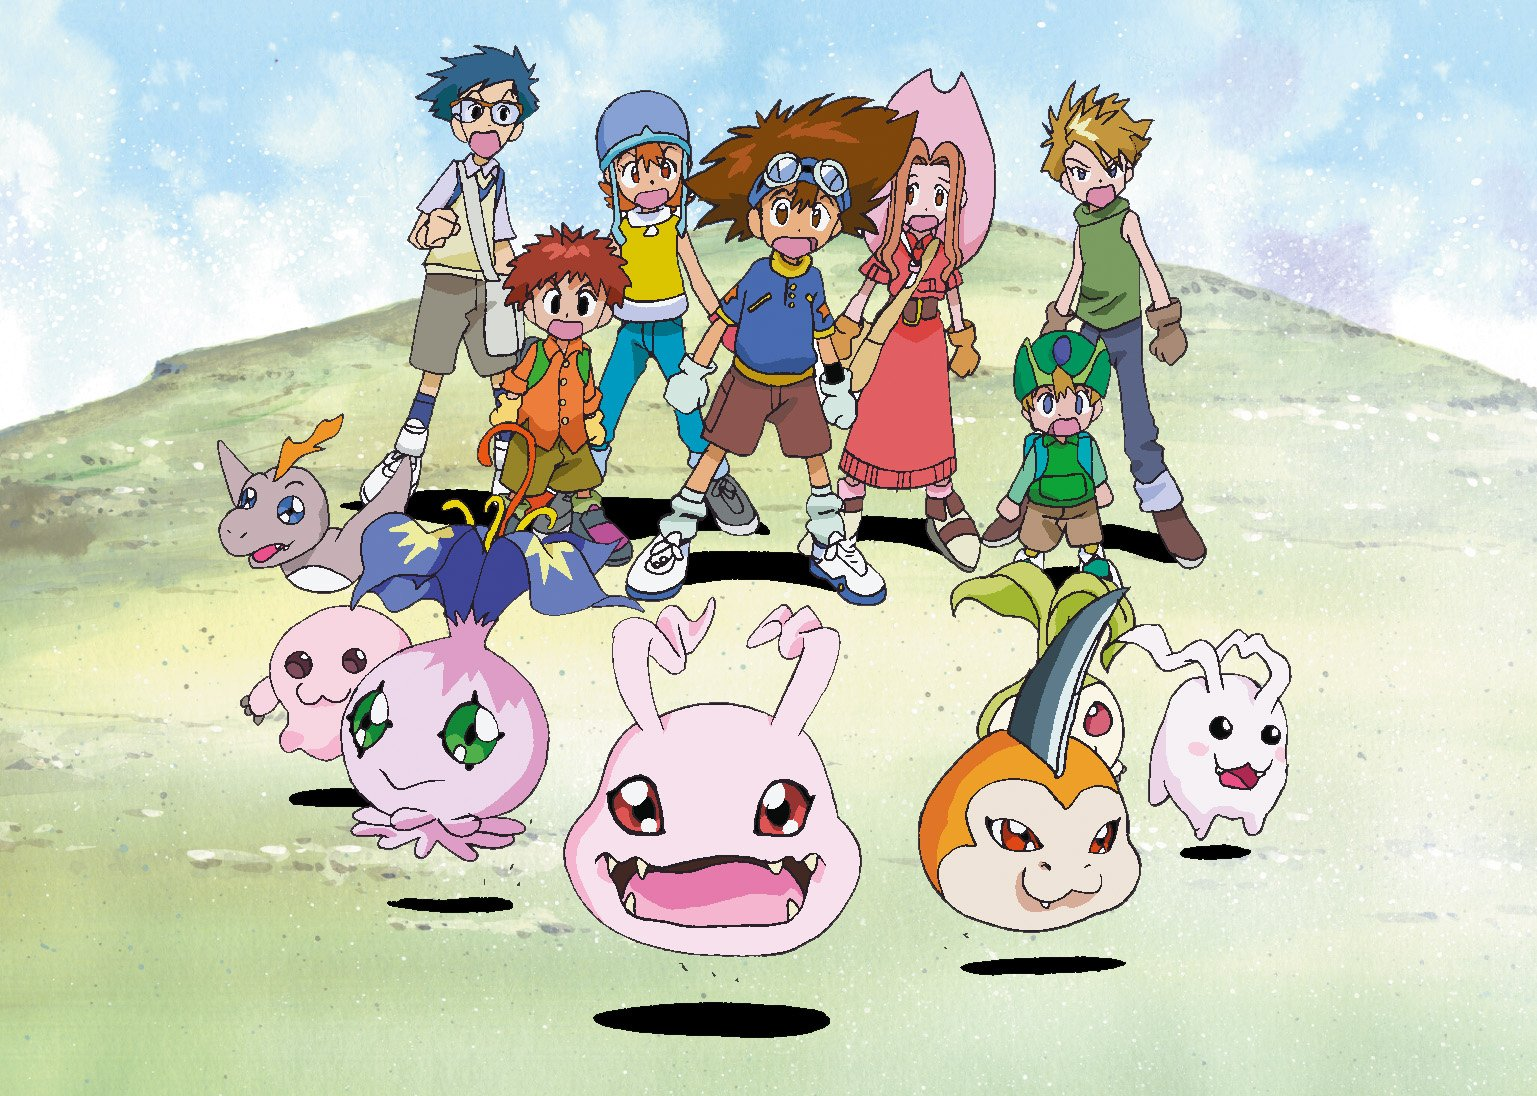 Digimon Adventure Review (Anime) - Rice Digital